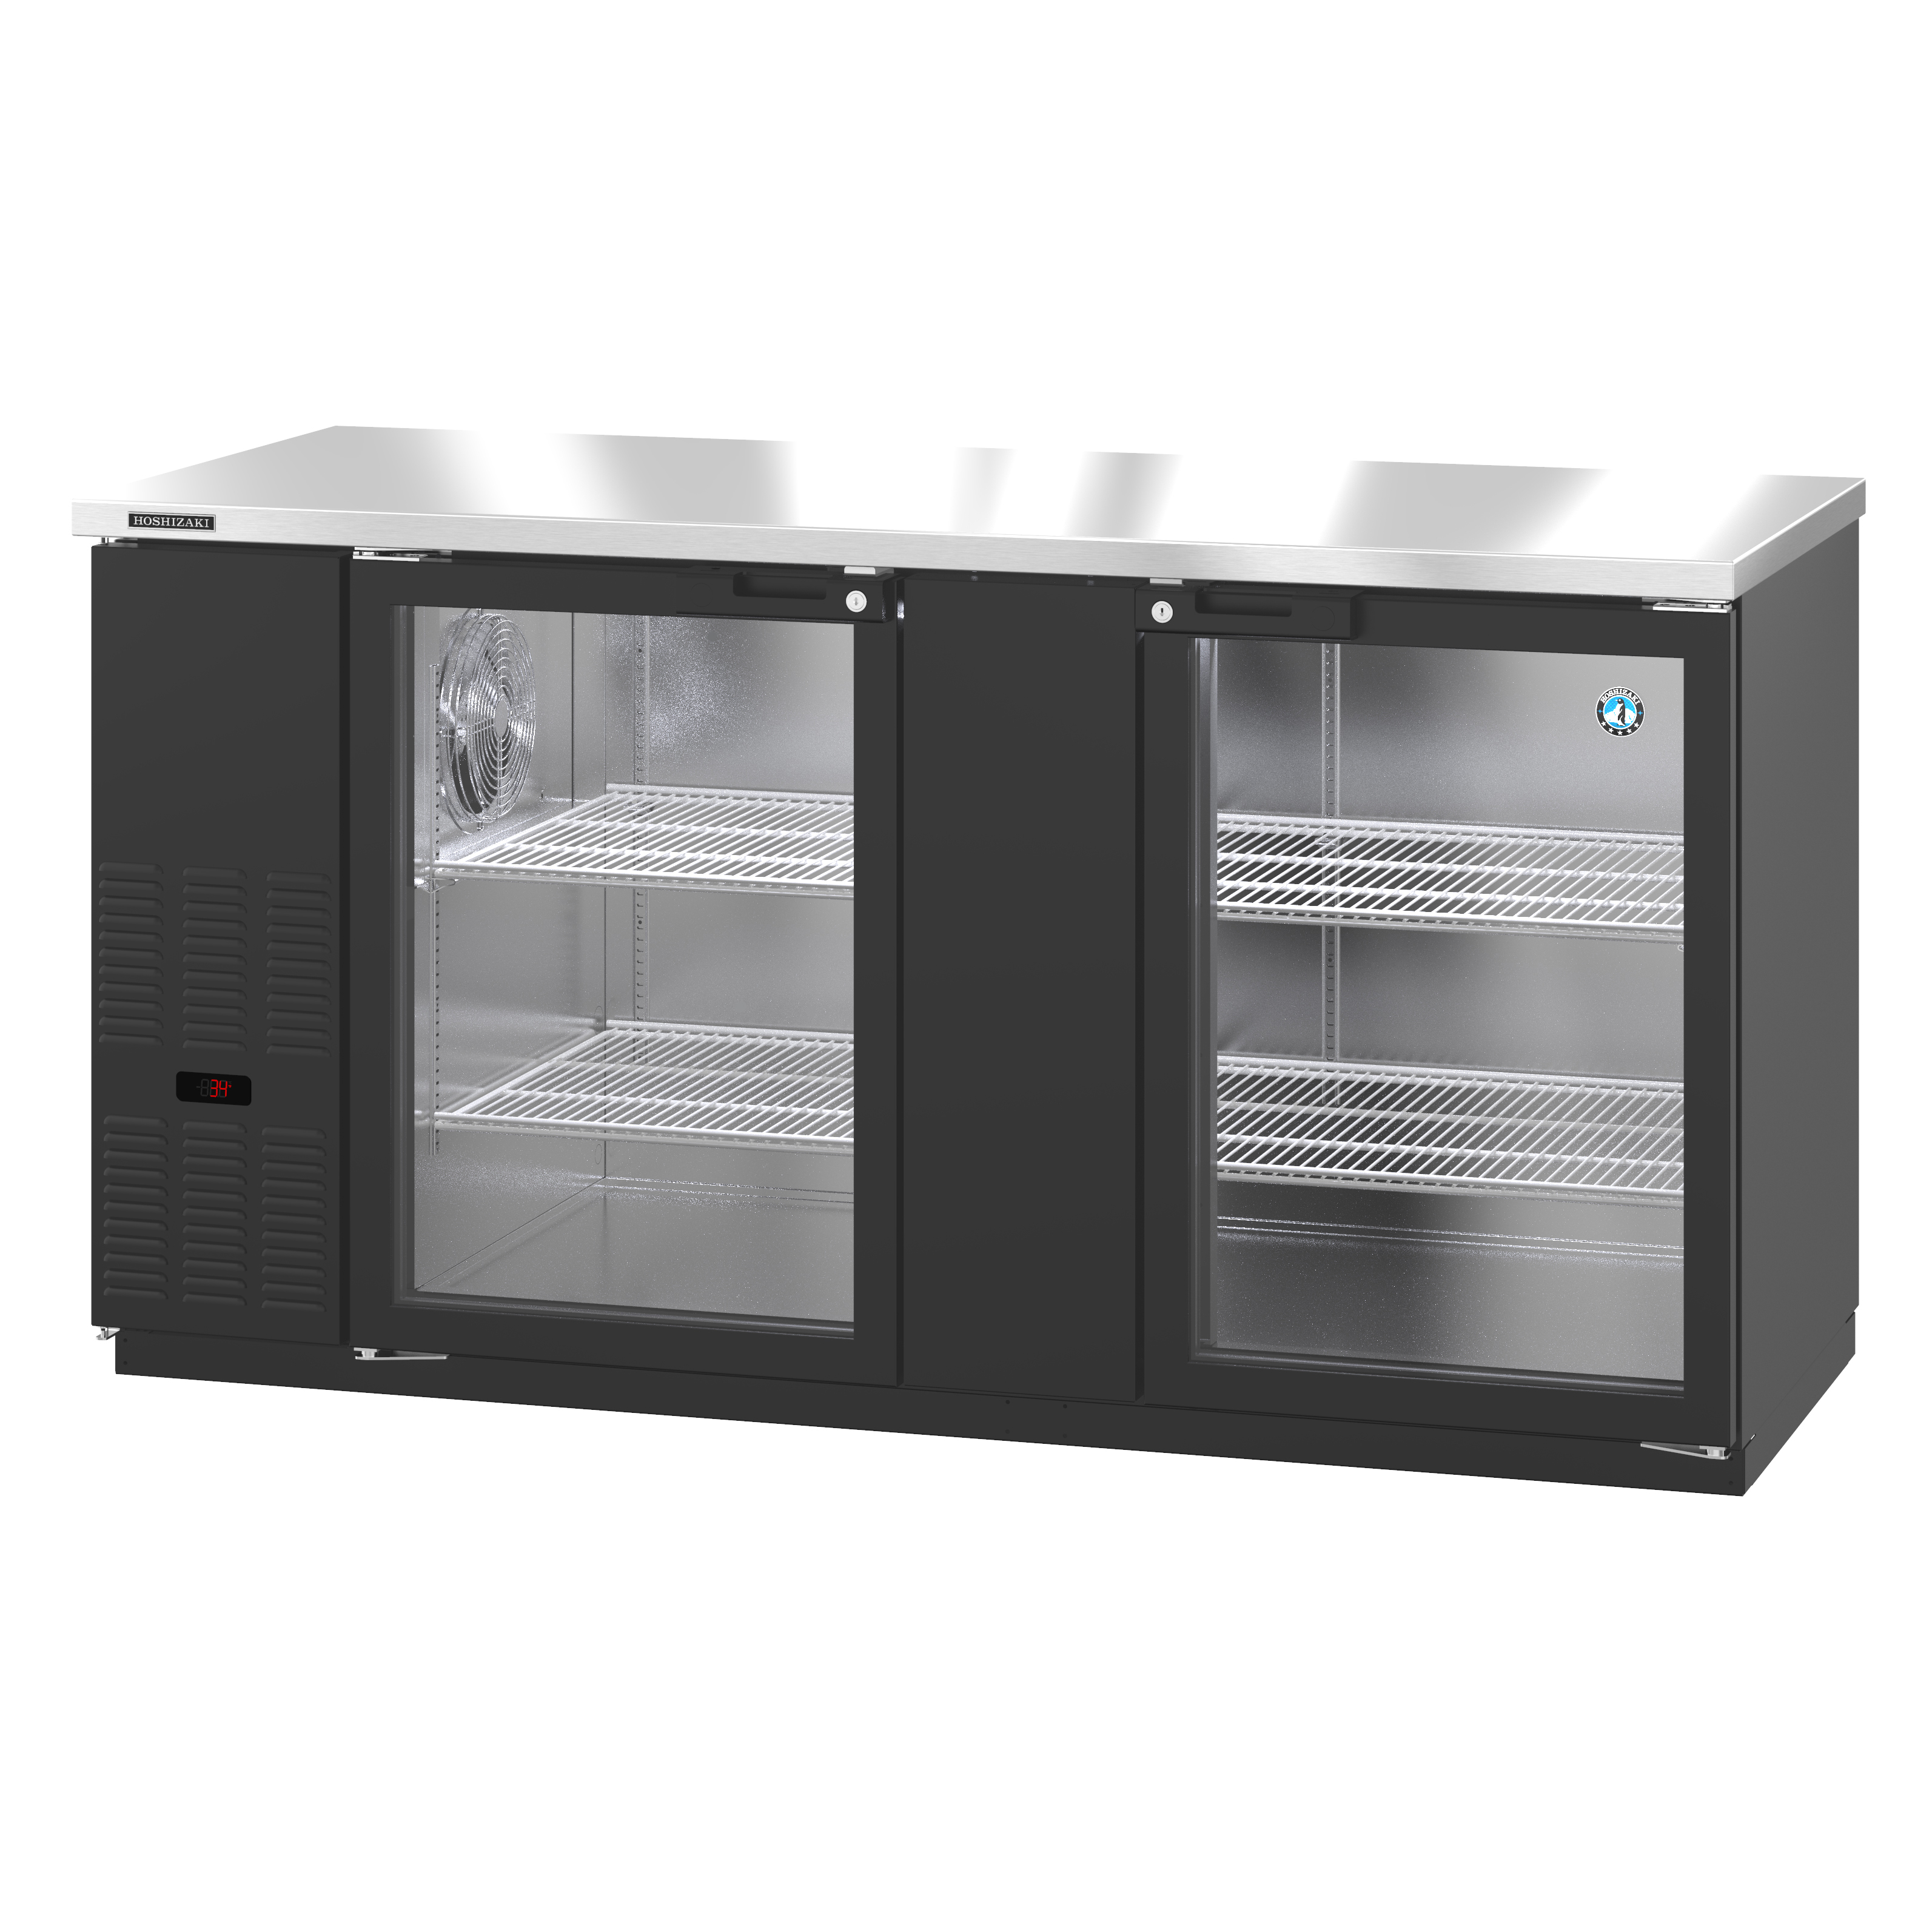 Hoshizaki BB69-G underbar equipment/refrigeration